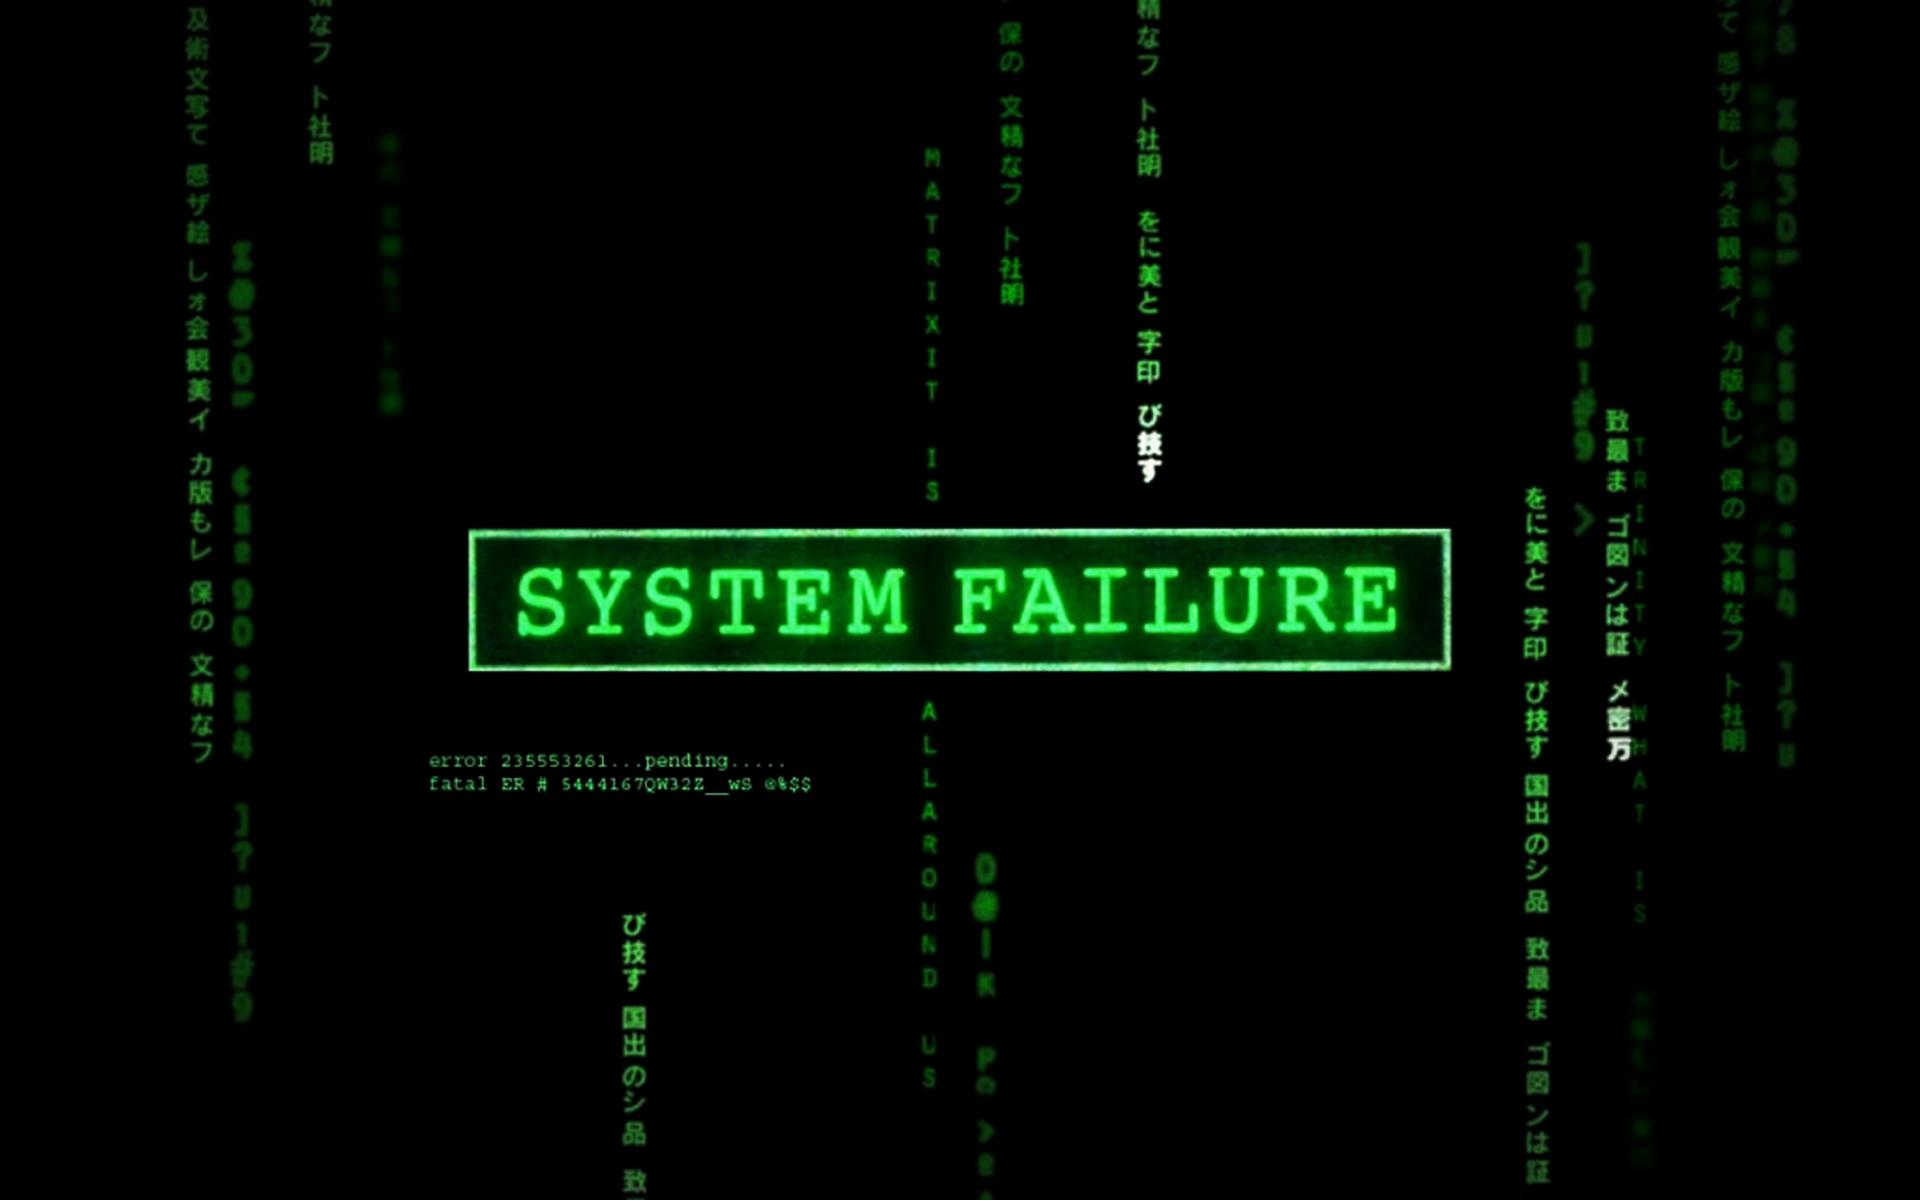 Ảnh nền của hacker